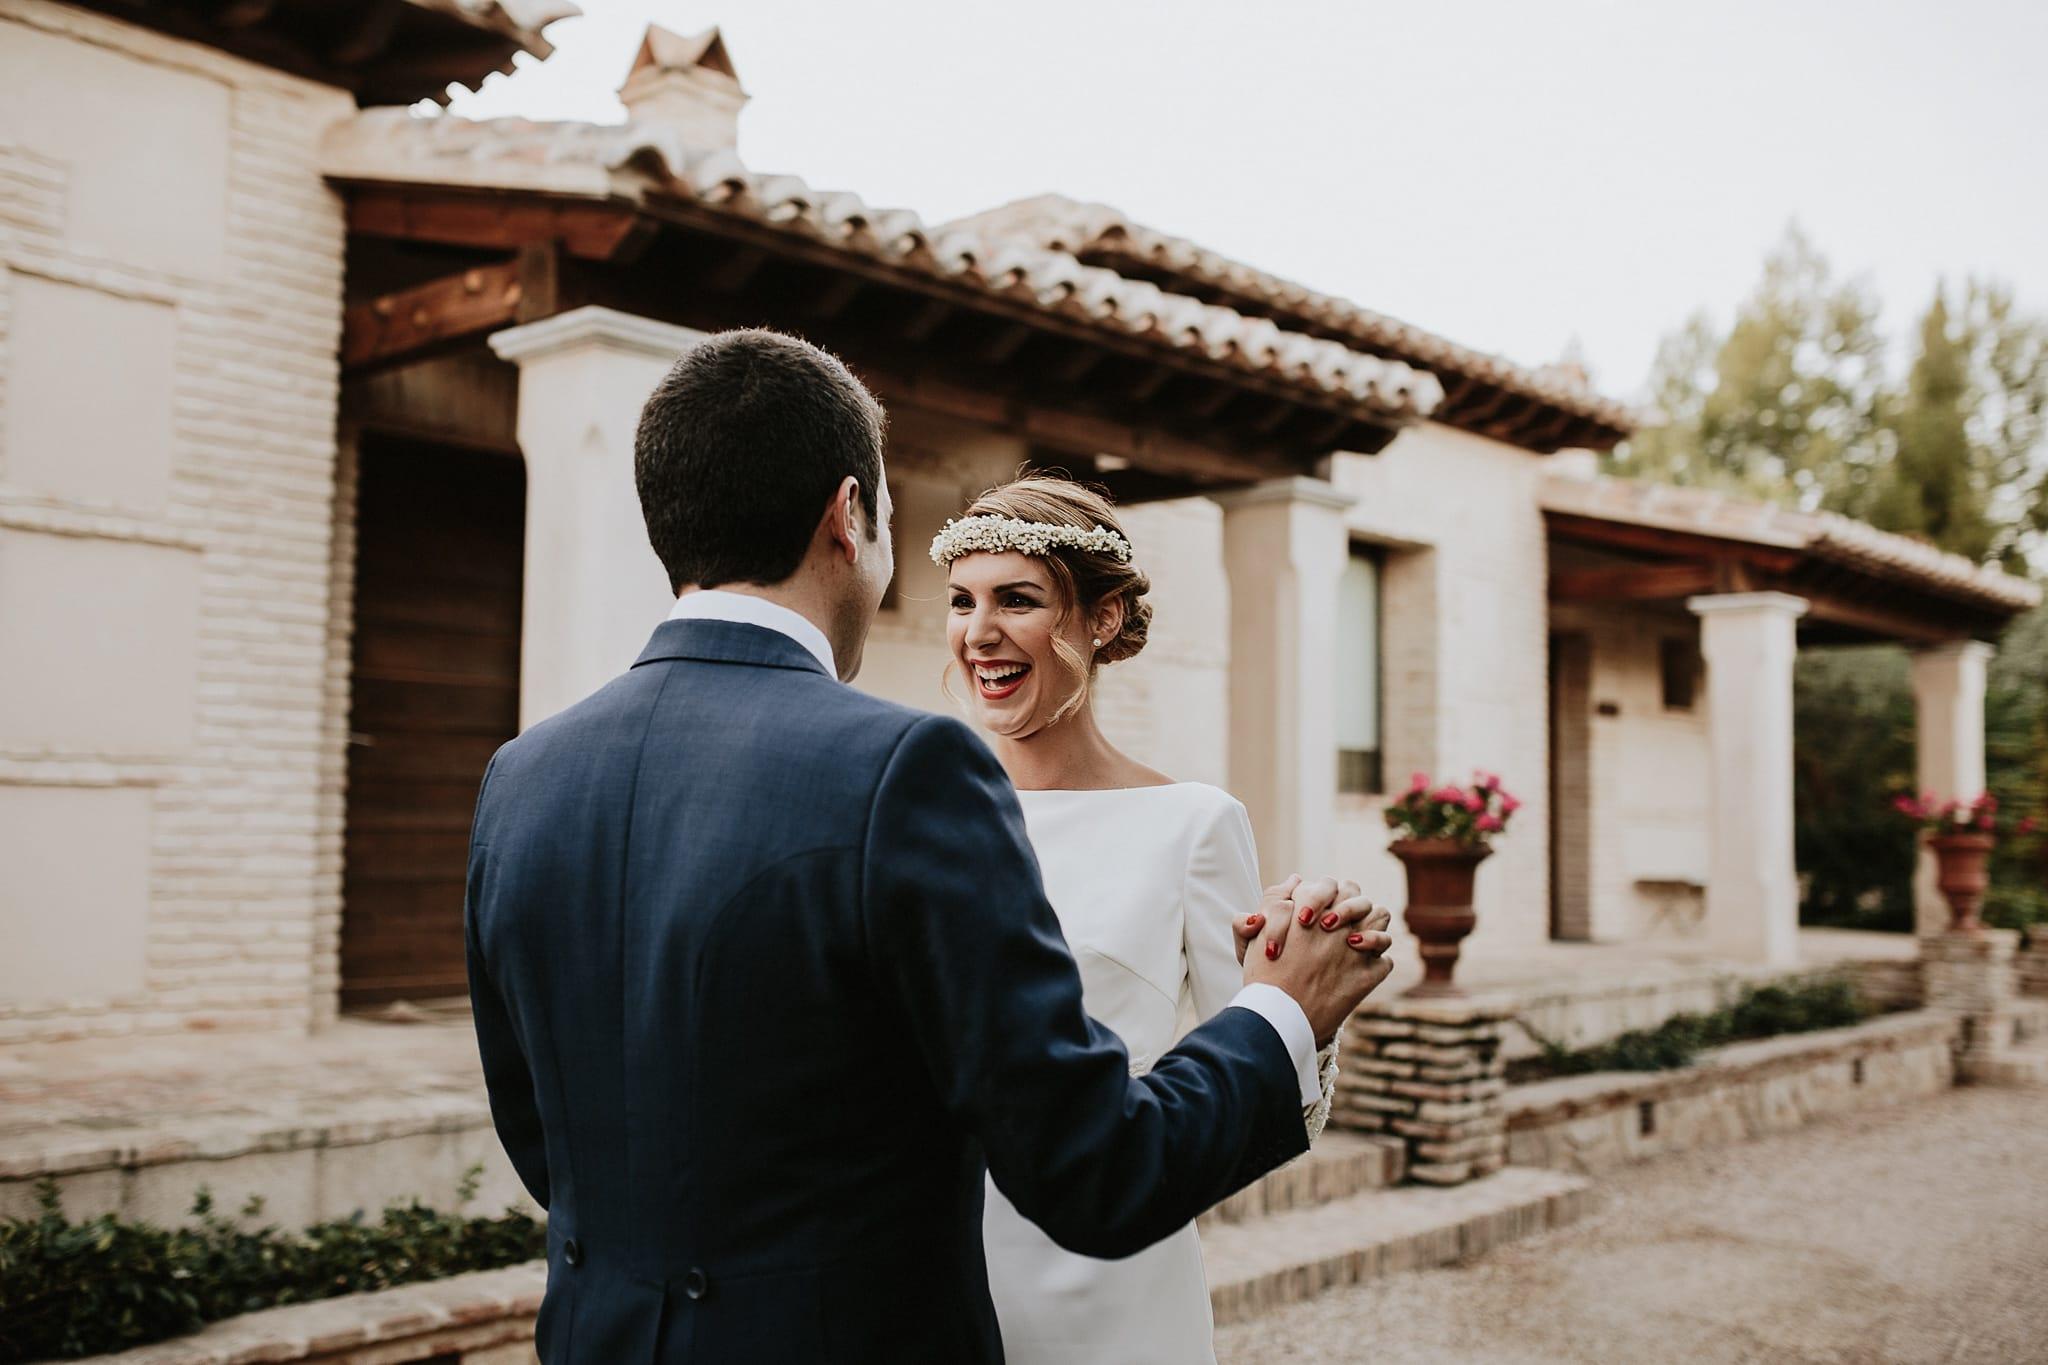 prisma-blanco-fotografos-bodas-toledo-87